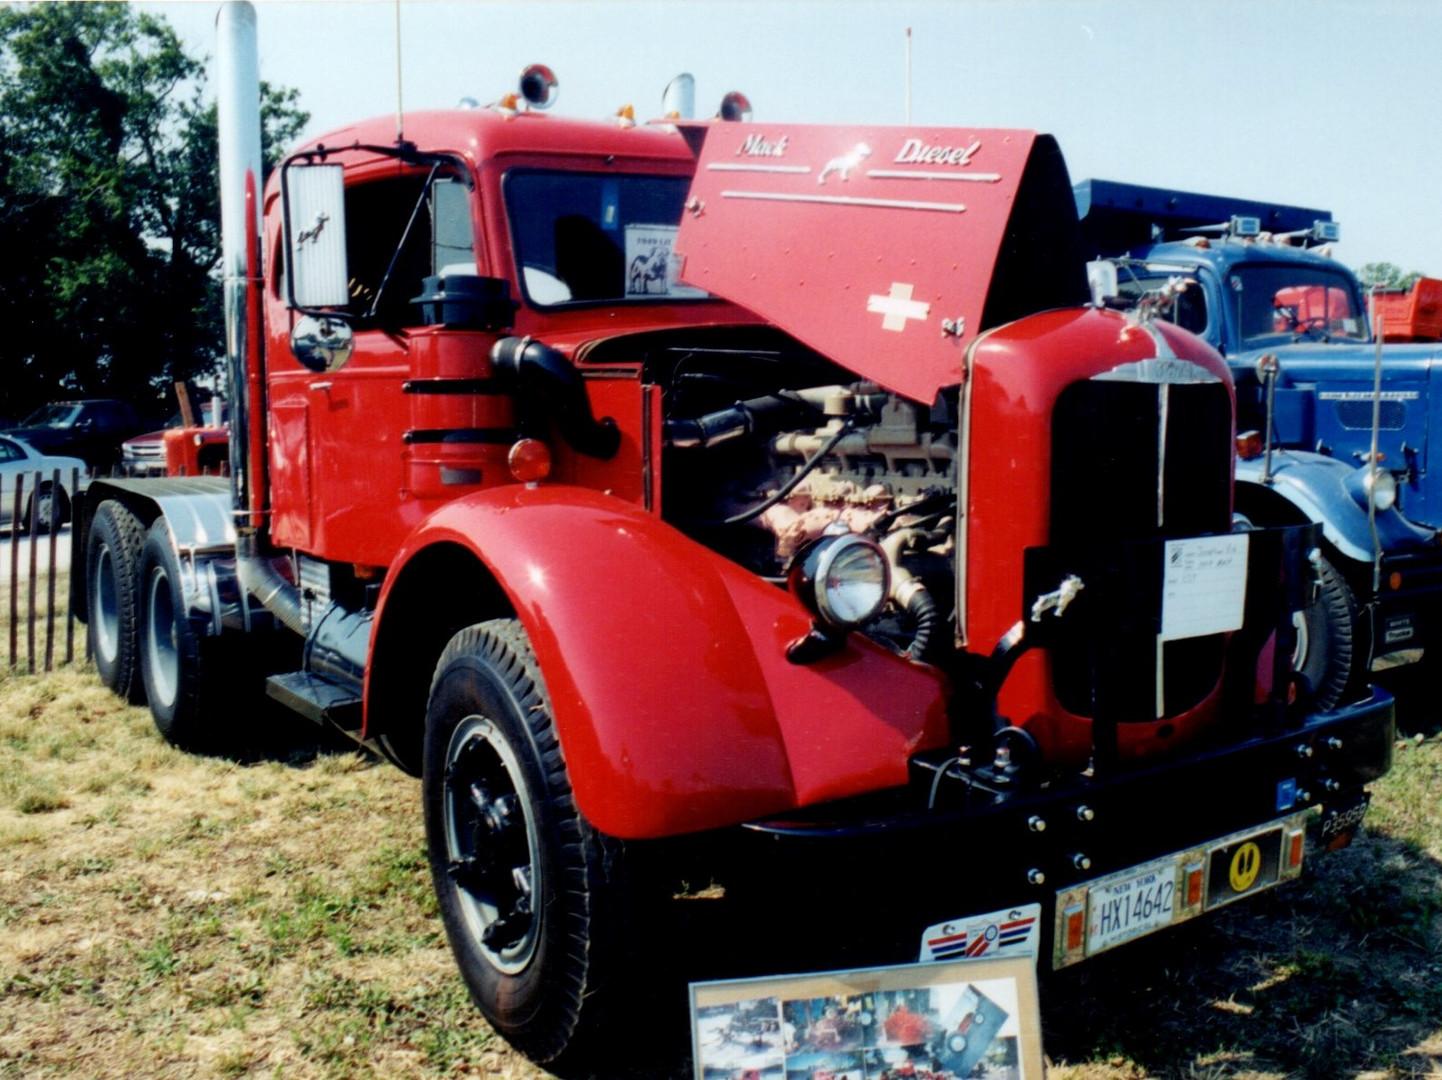 1949 Mack LJT tractor - Jonathan Erb